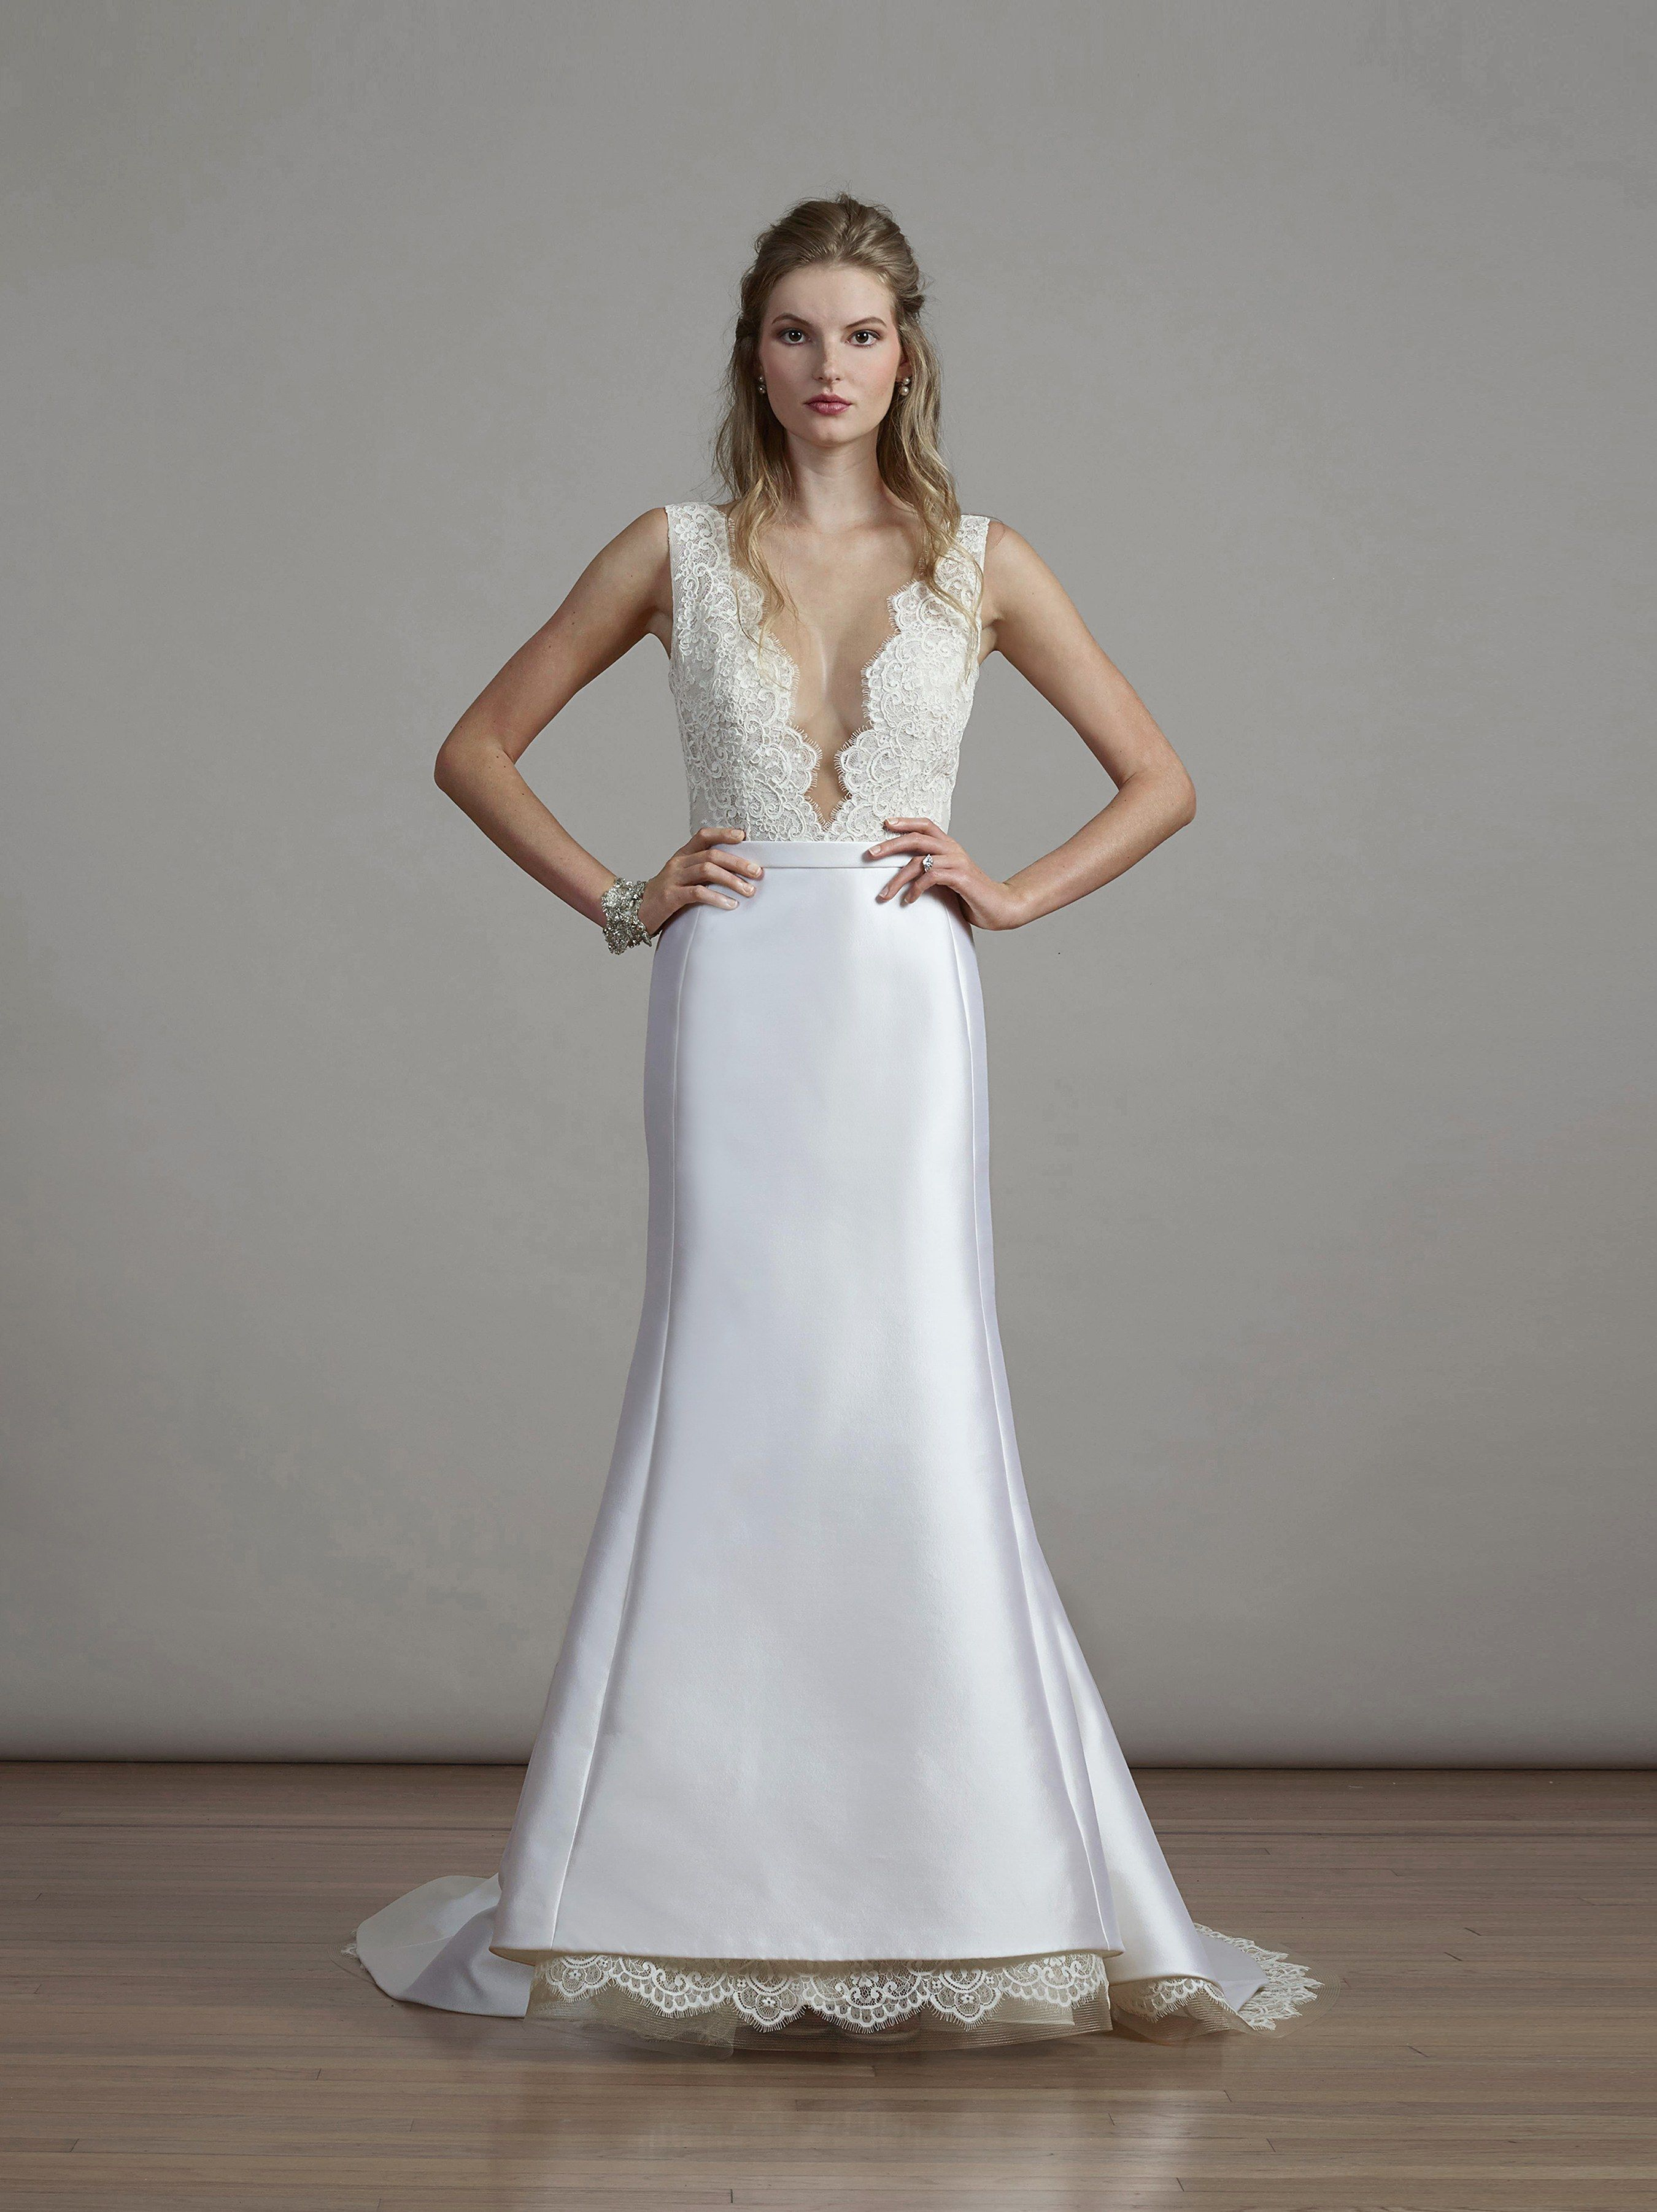 Liancarlo bridal u wedding dress collection spring brides